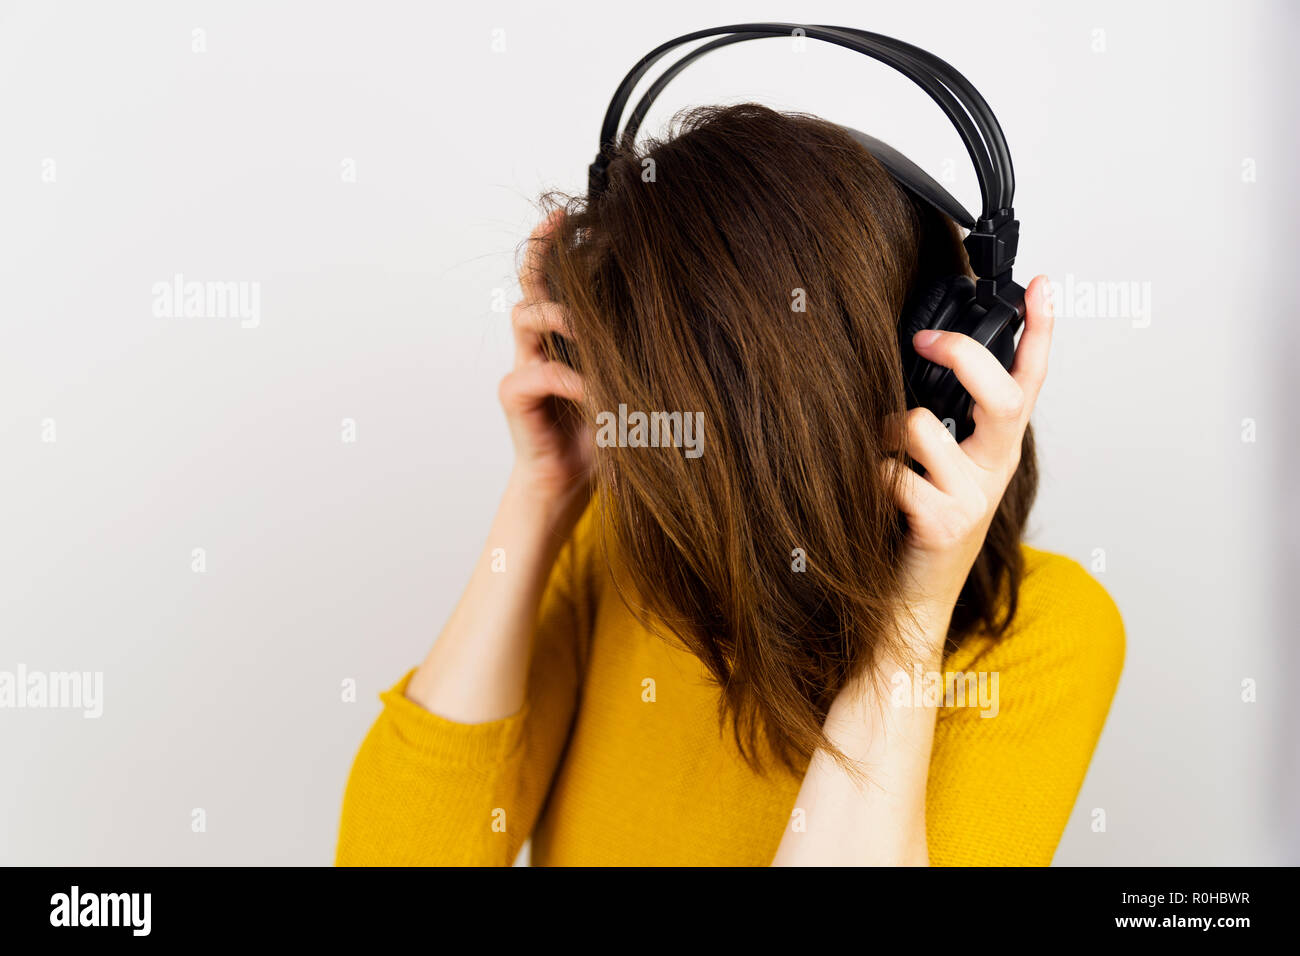 Beautiful women listening to music with headphones. - Stock Image